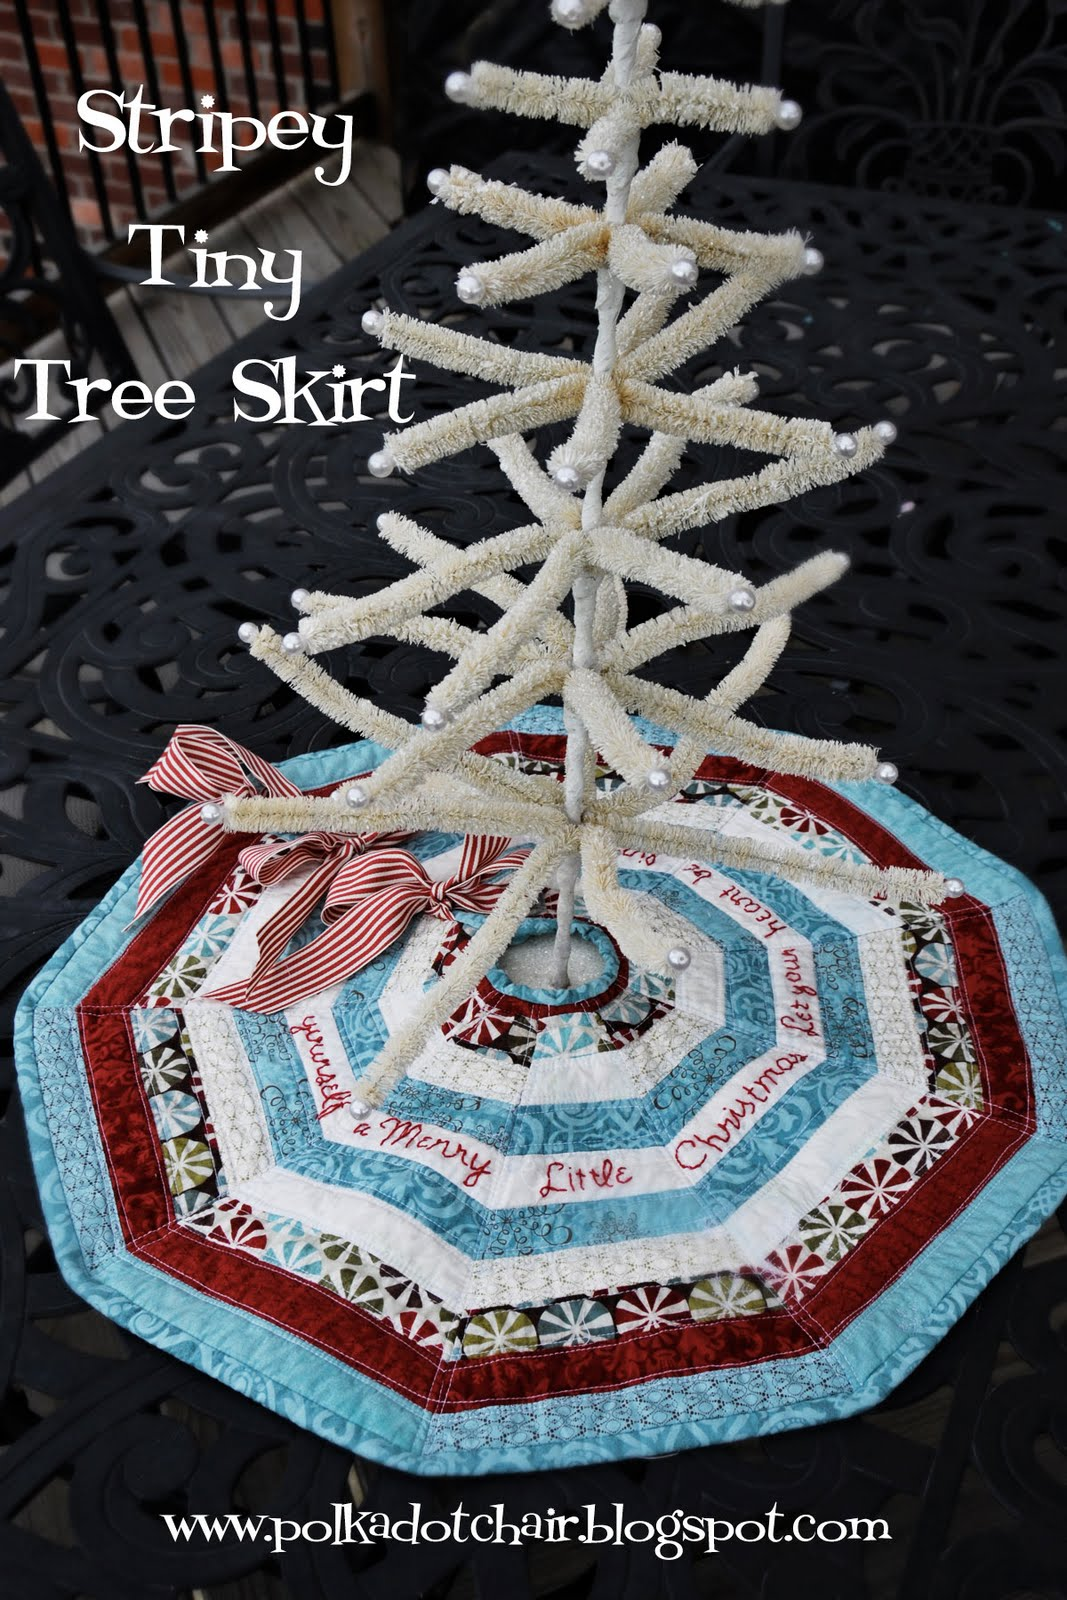 Stripey Skinny Seasonal Table Runner Stripey Tiny Tree Skirt